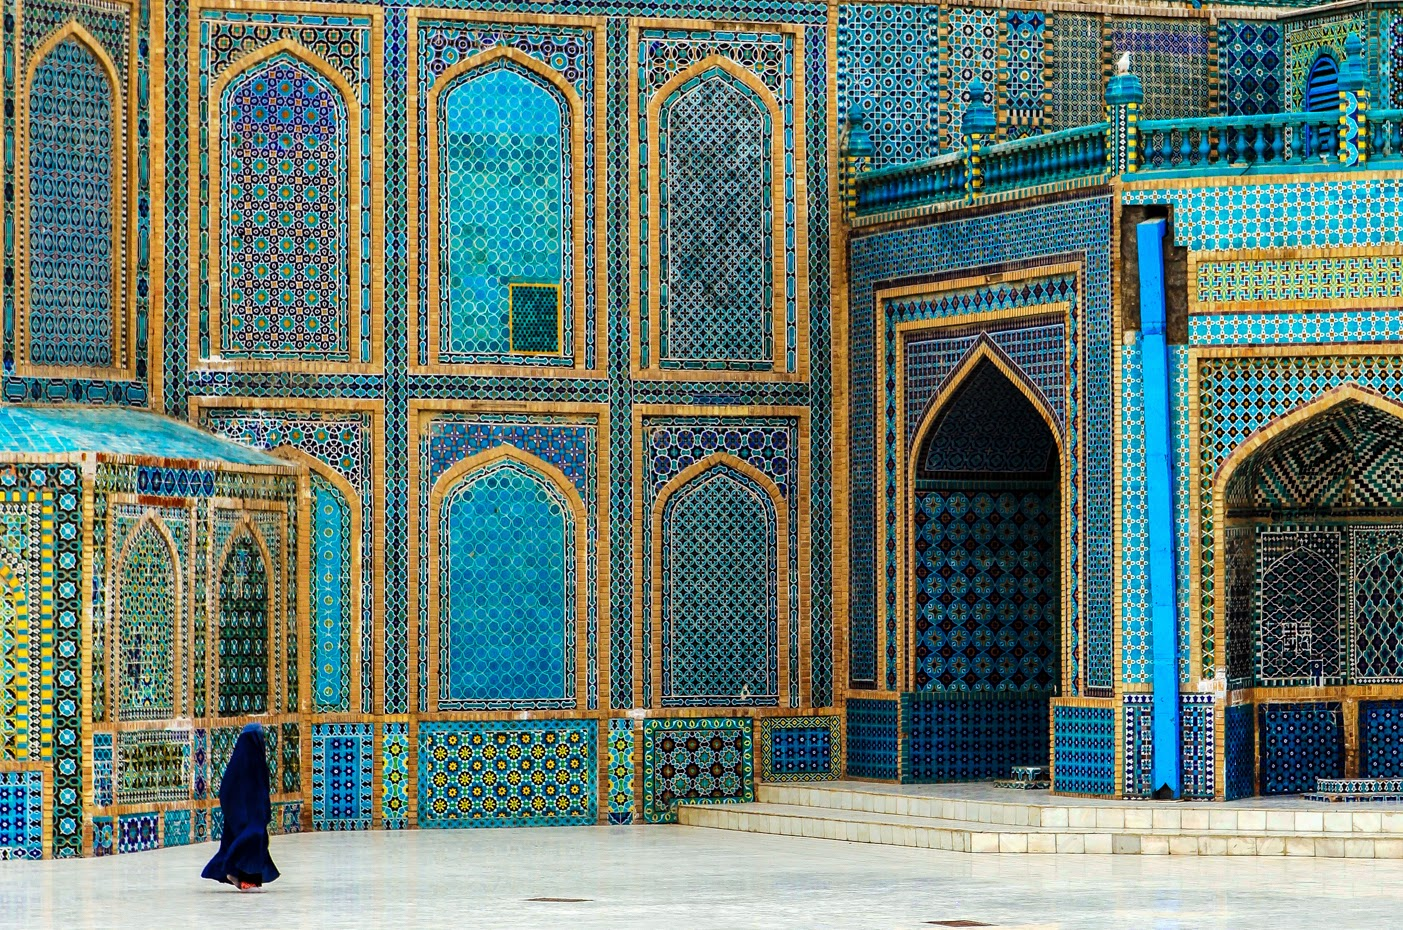 Woman in Mazar-e Sharif